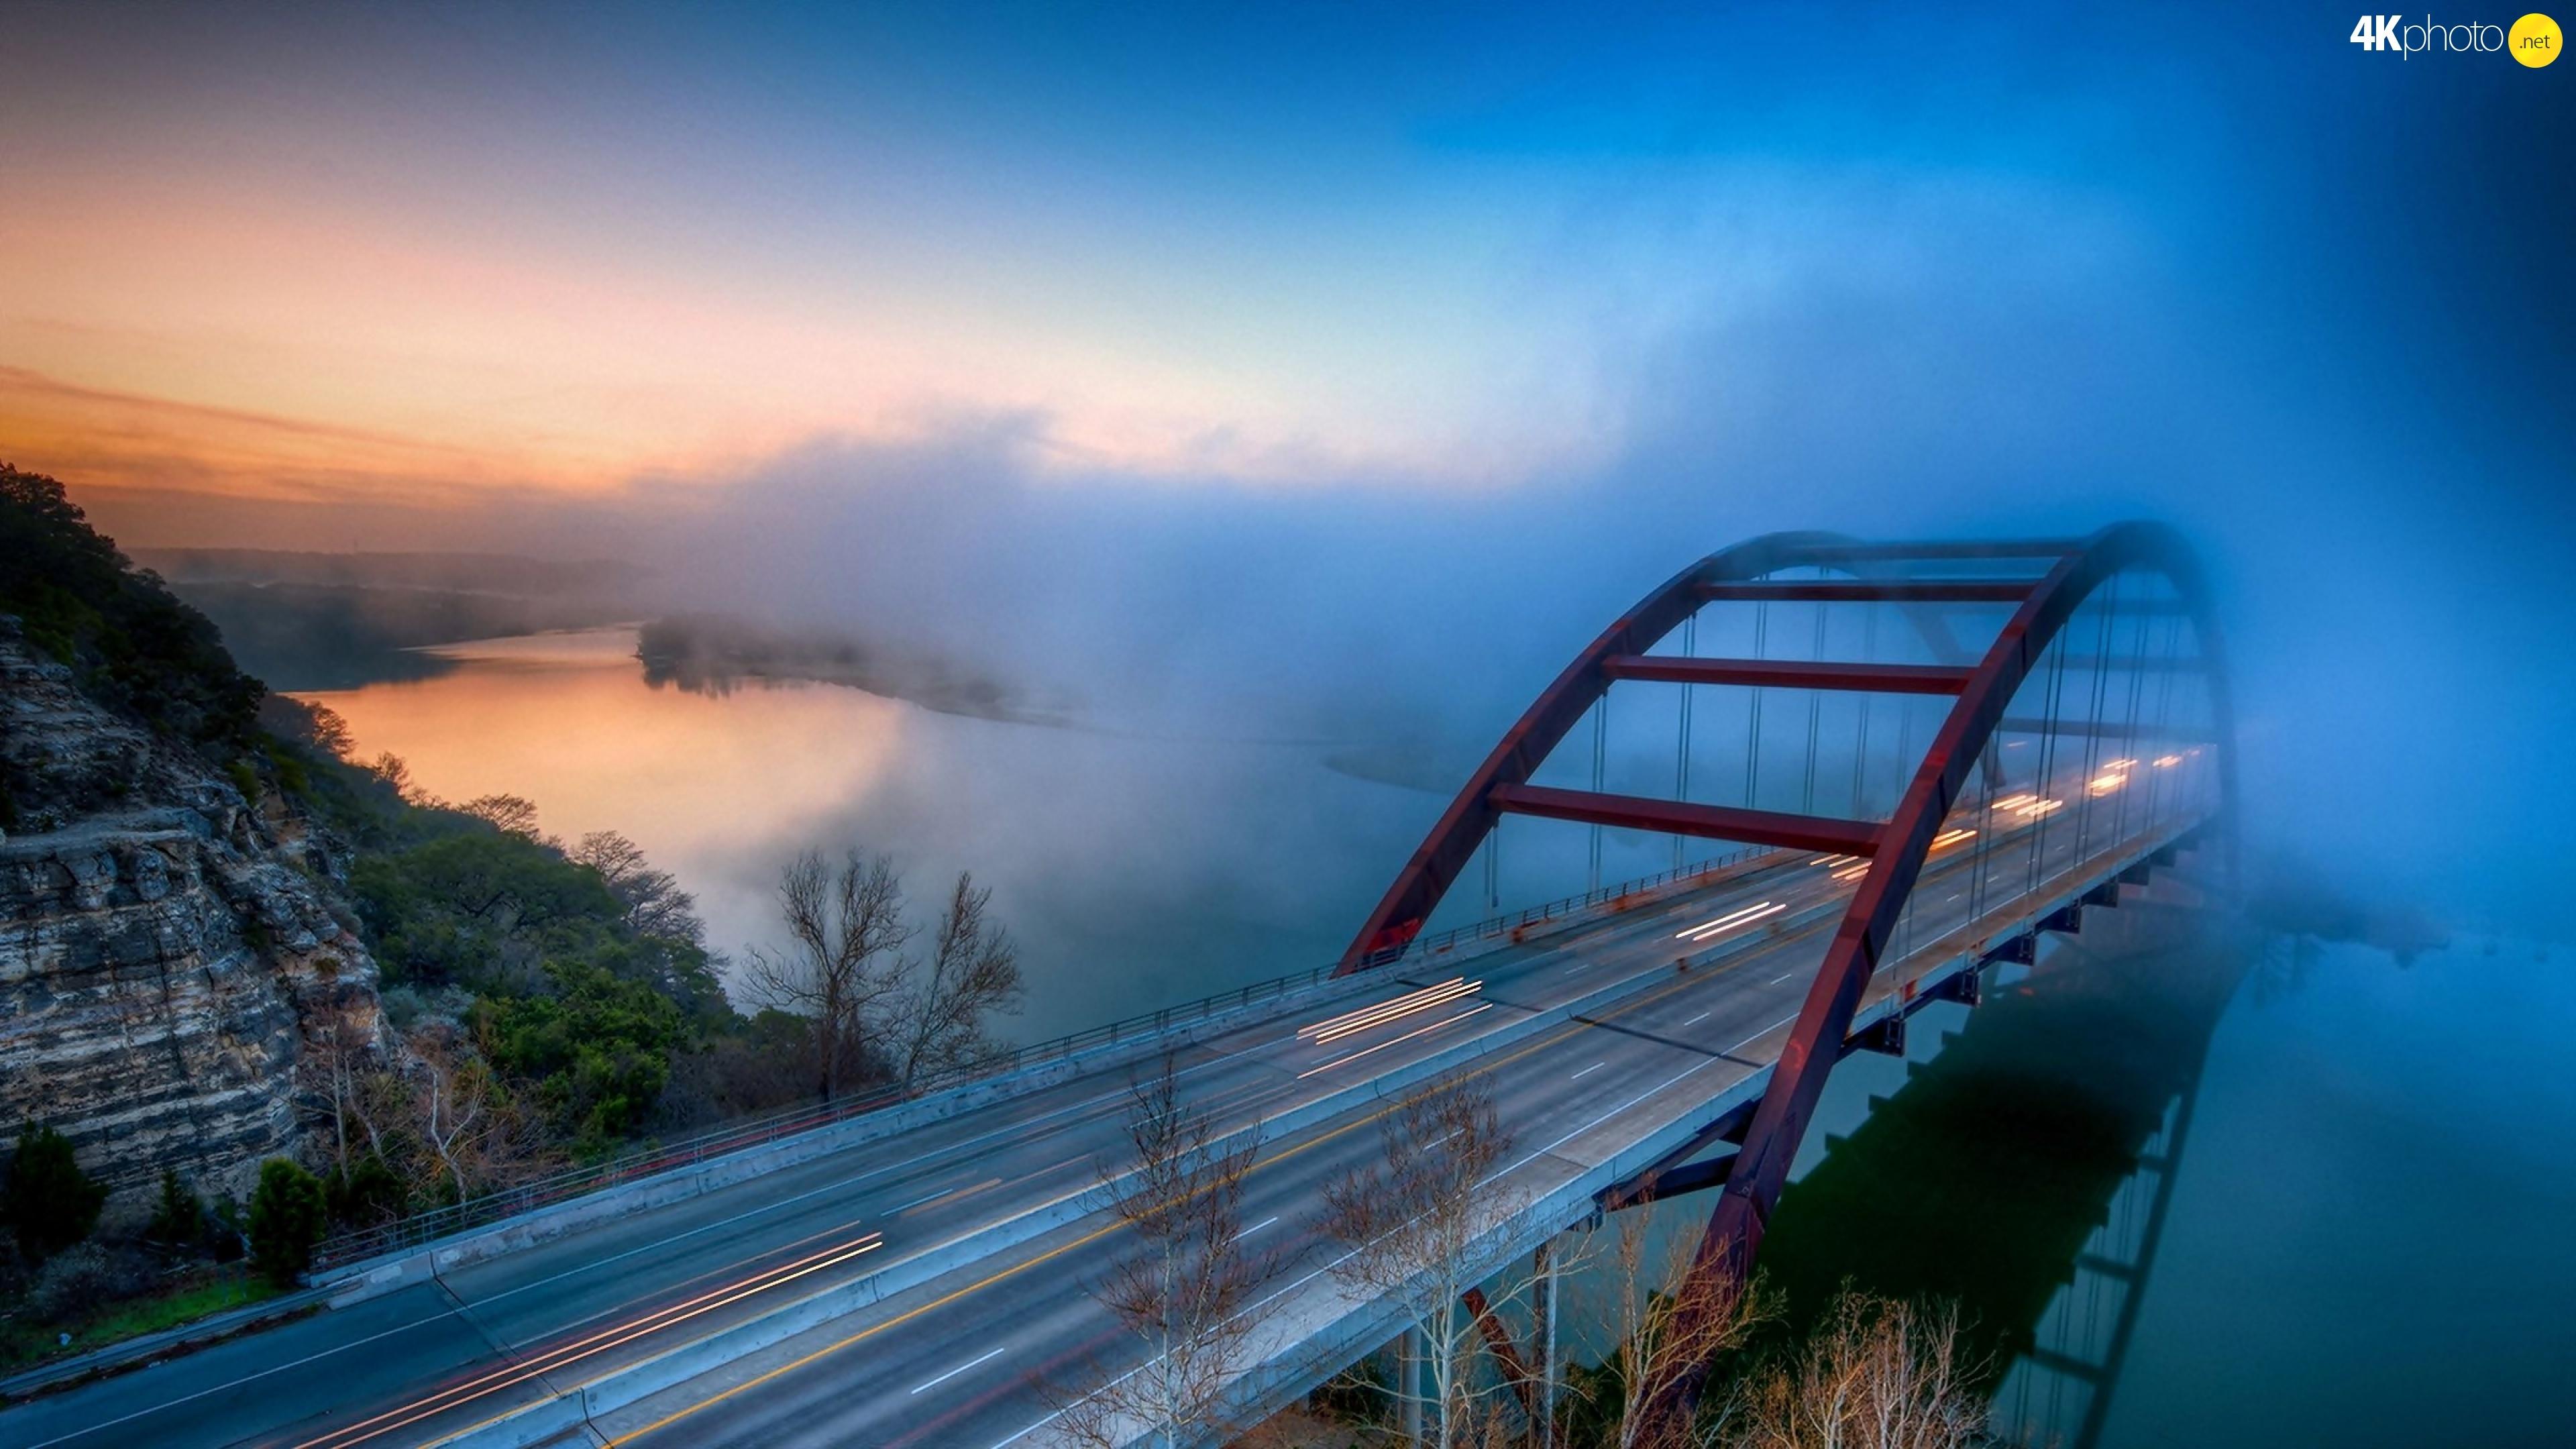 Город мост через реку  № 3713121 бесплатно